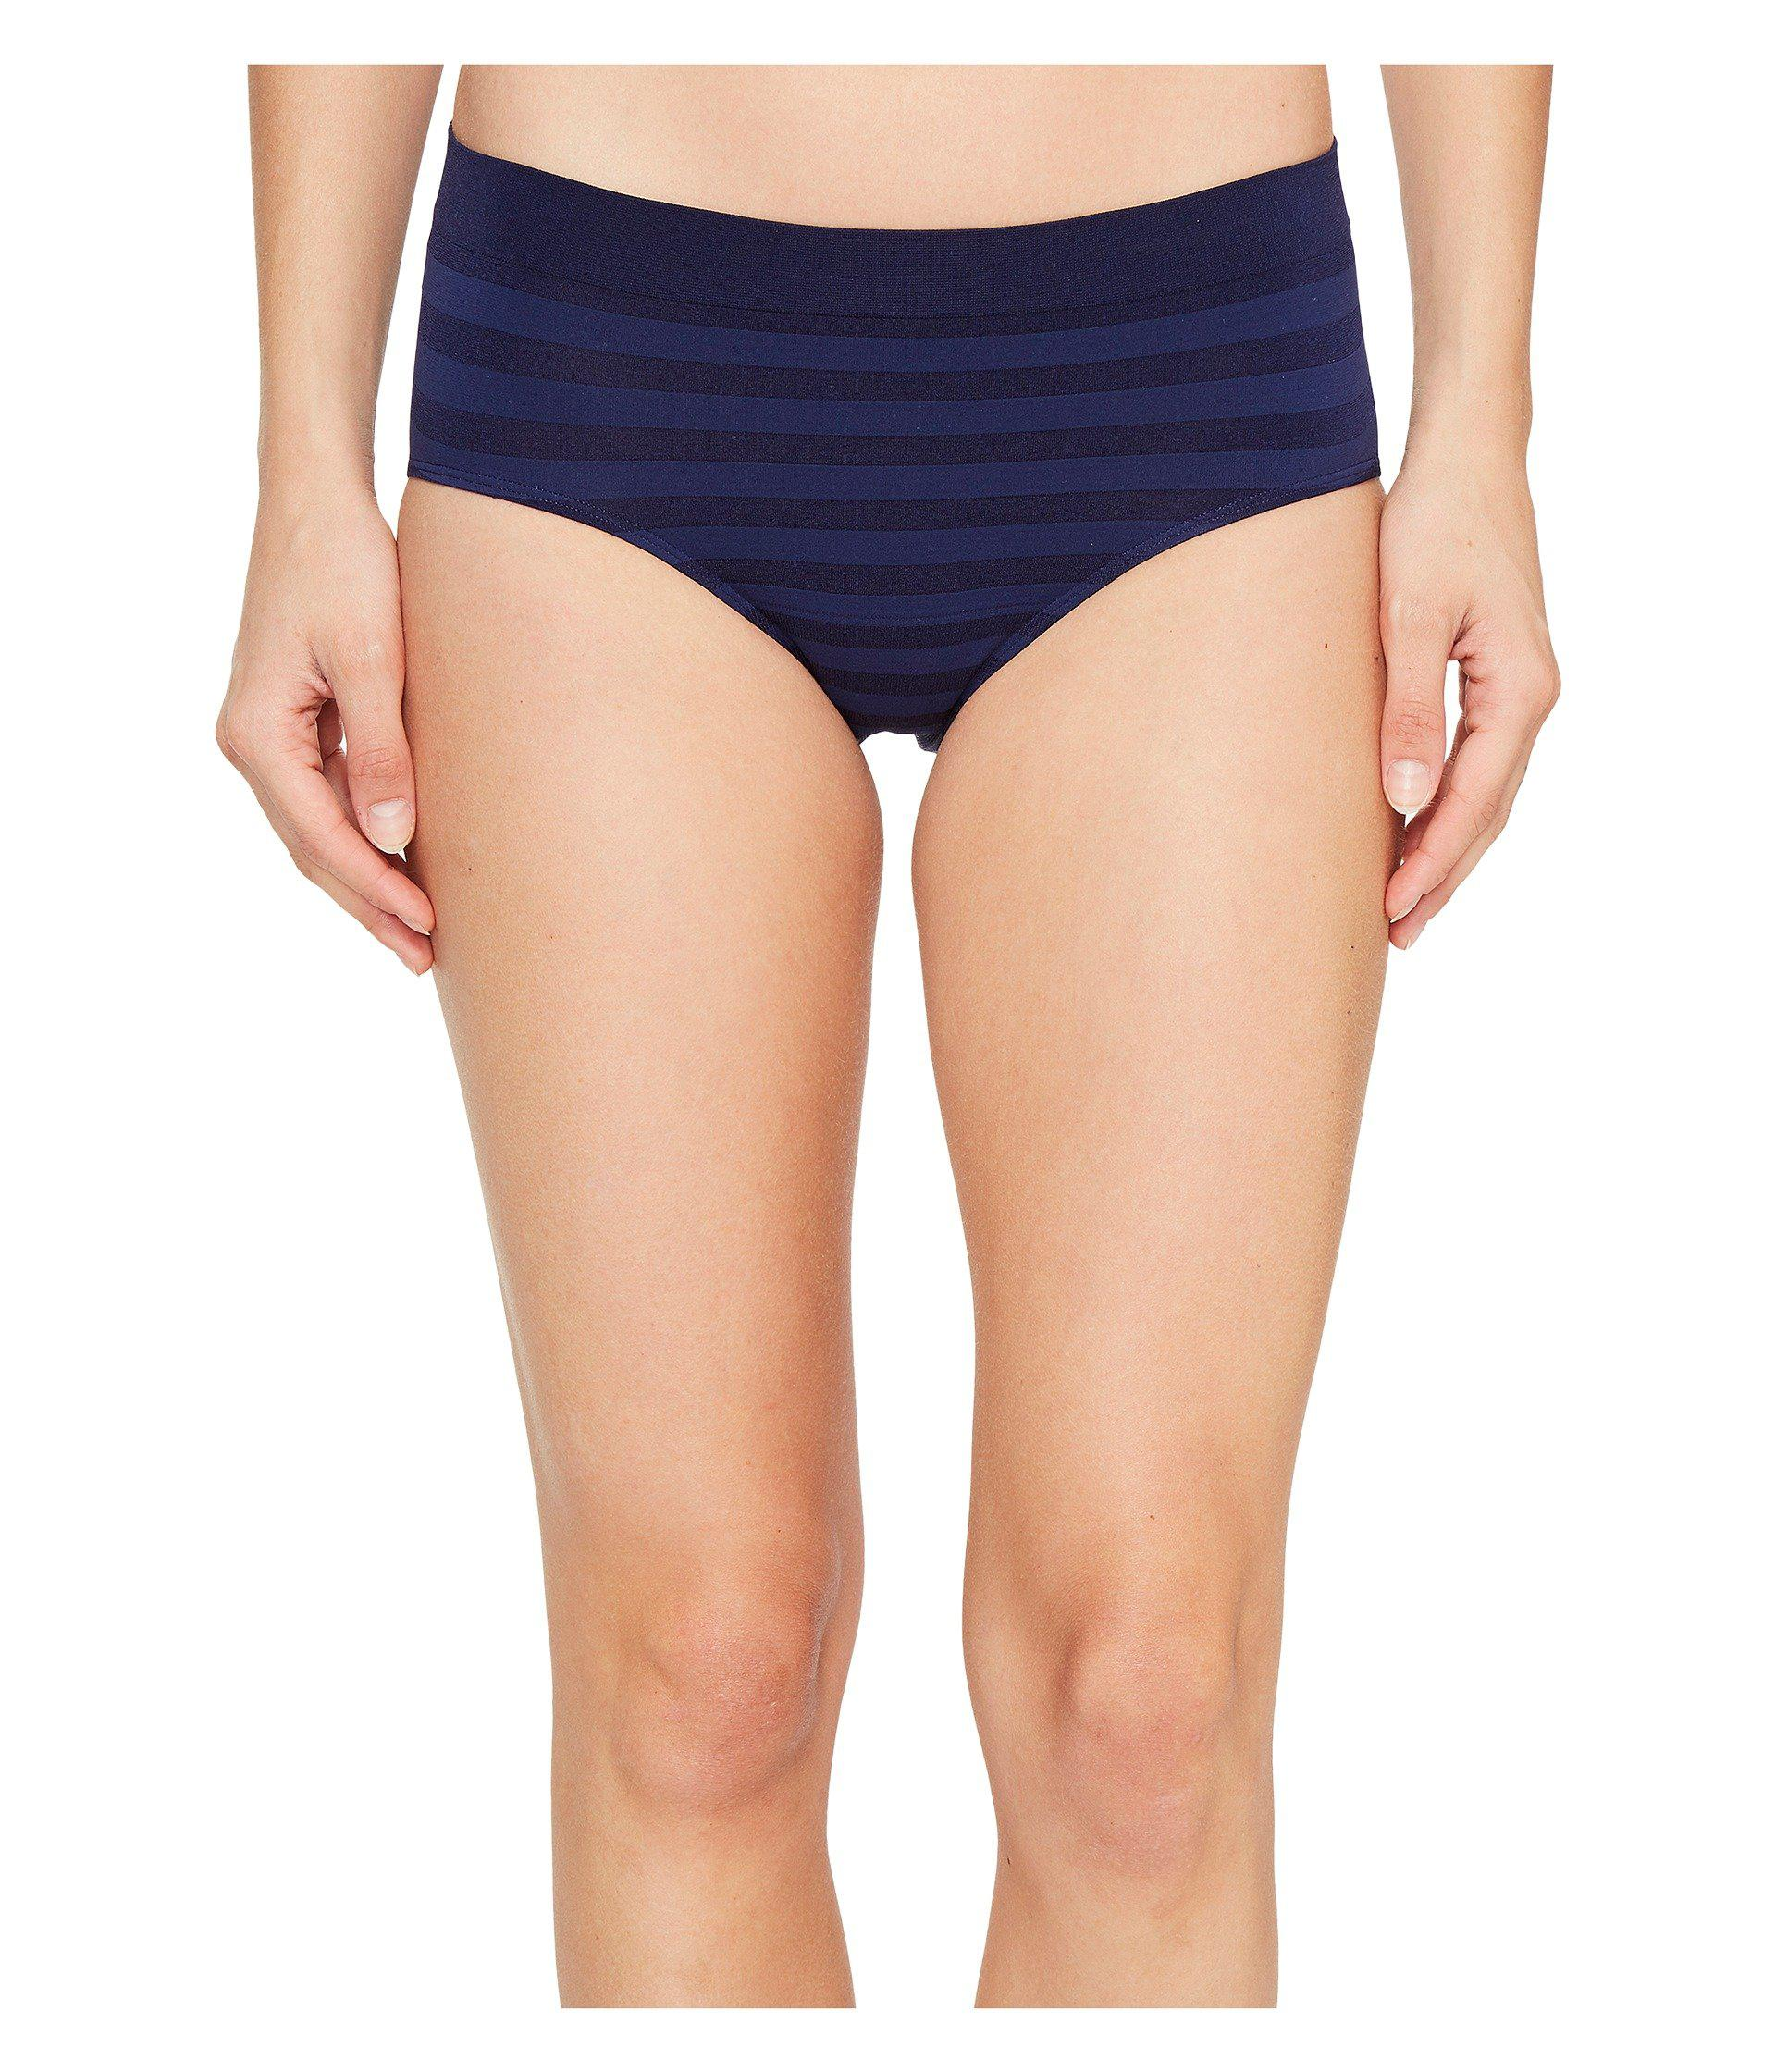 281d46b6195 Jockey. Blue Comfies(r) Matte Shine Hipster (black) Women s Underwear